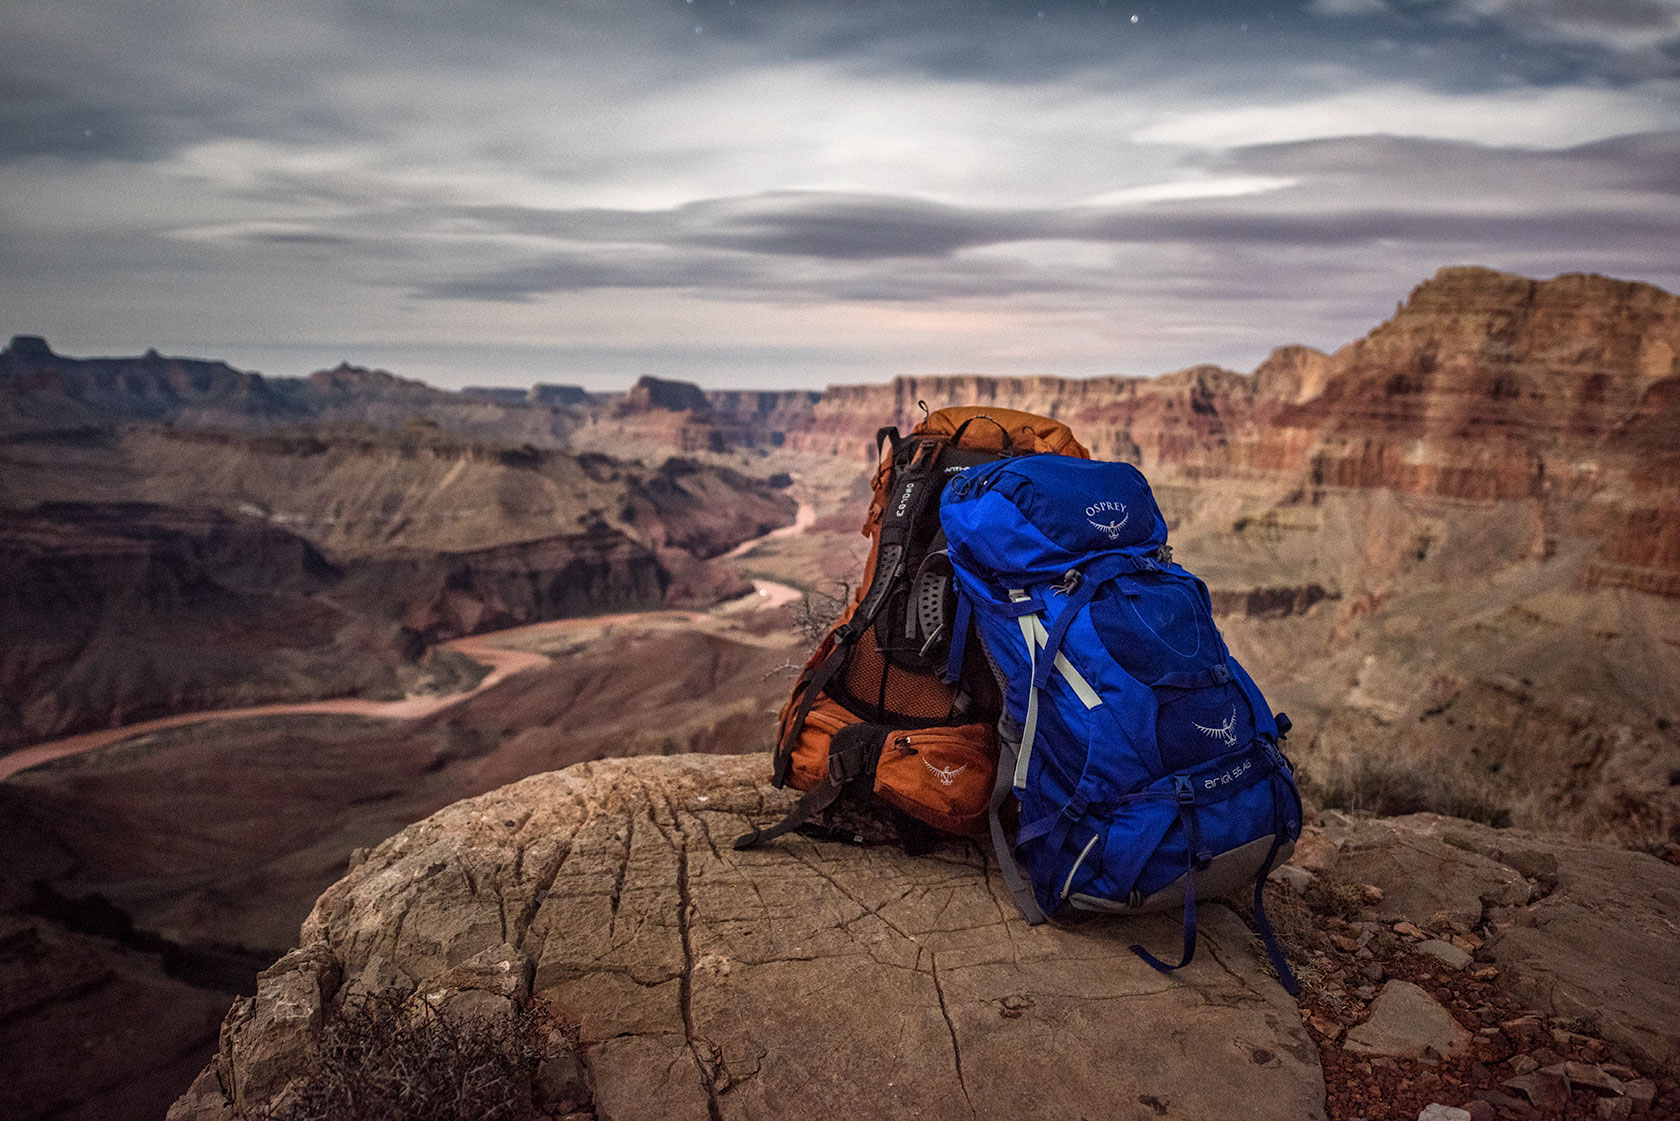 austin-trigg-osprey-hiking-backpacks-grand-canyon-osprey-pack-bag-arizona-hike-camp-night-long-exposure-product-stars.jpg